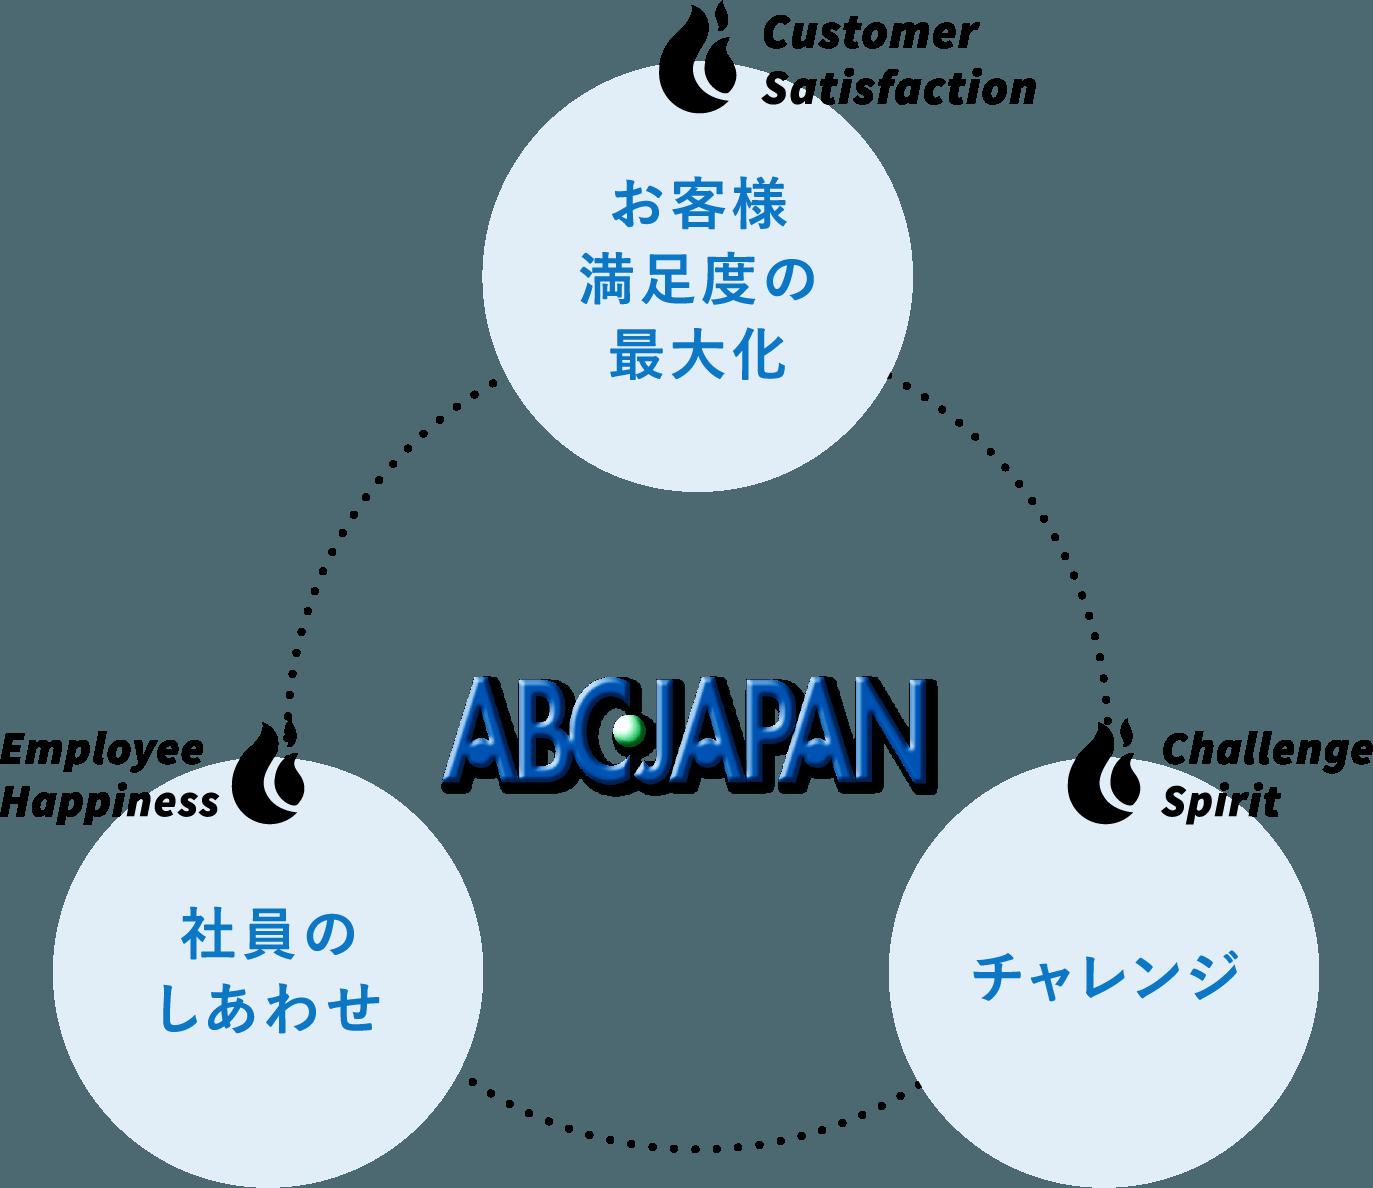 ABCジャパン企業理念